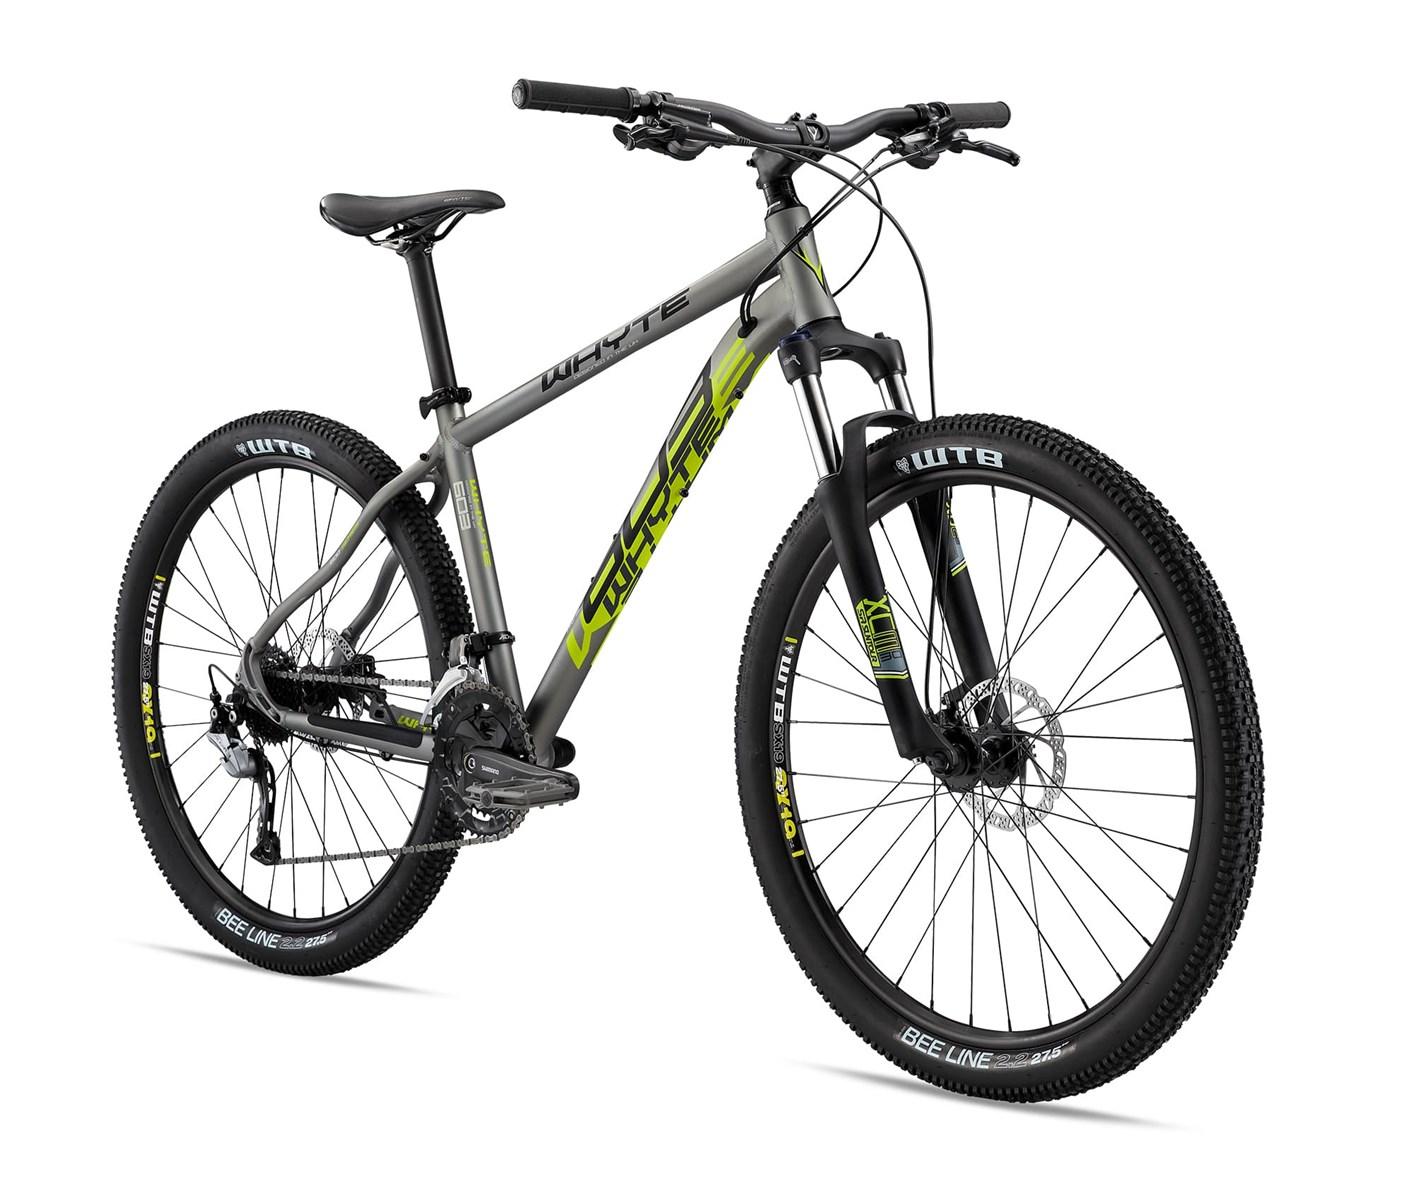 2017 Whyte 603 27.5 Cross Country Mountain Bike £479.20 f670b6ba6a1ac